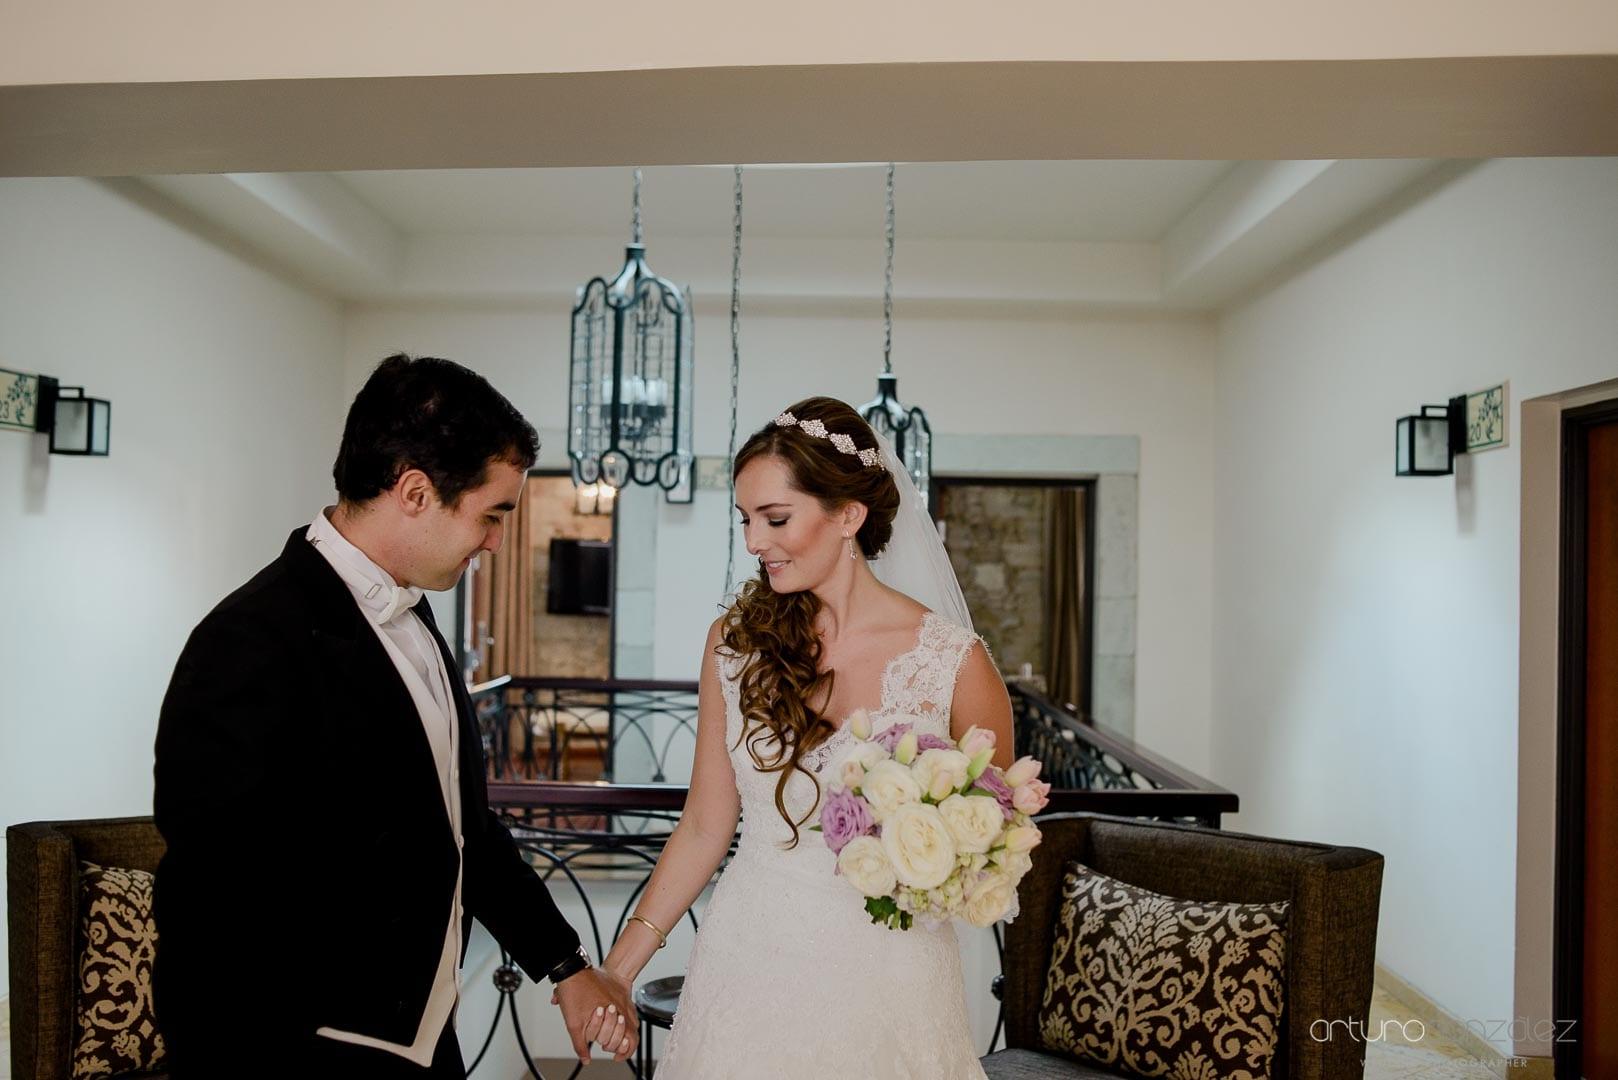 fotografo-de-bodas-en-guanajuato-22